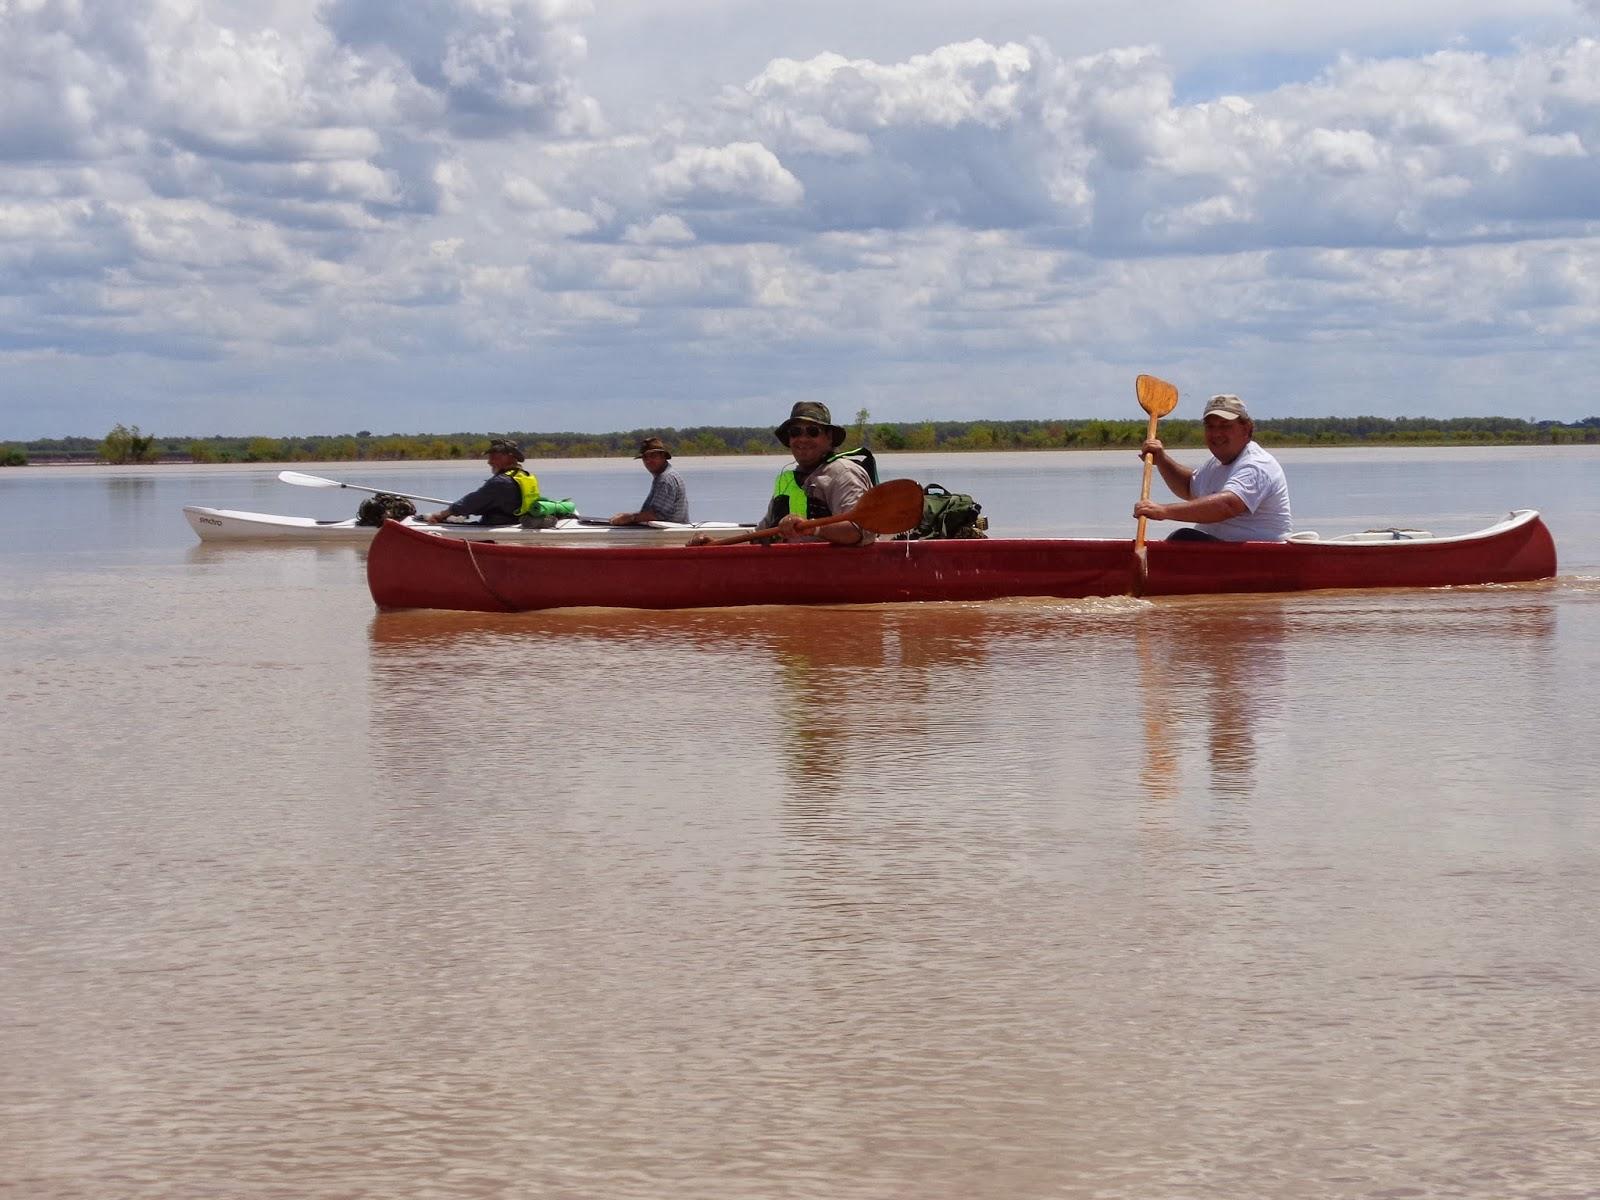 BAJADA DEL PARANA 2014 de Diamate a Rosario,, 96 km de alegria DSC01697